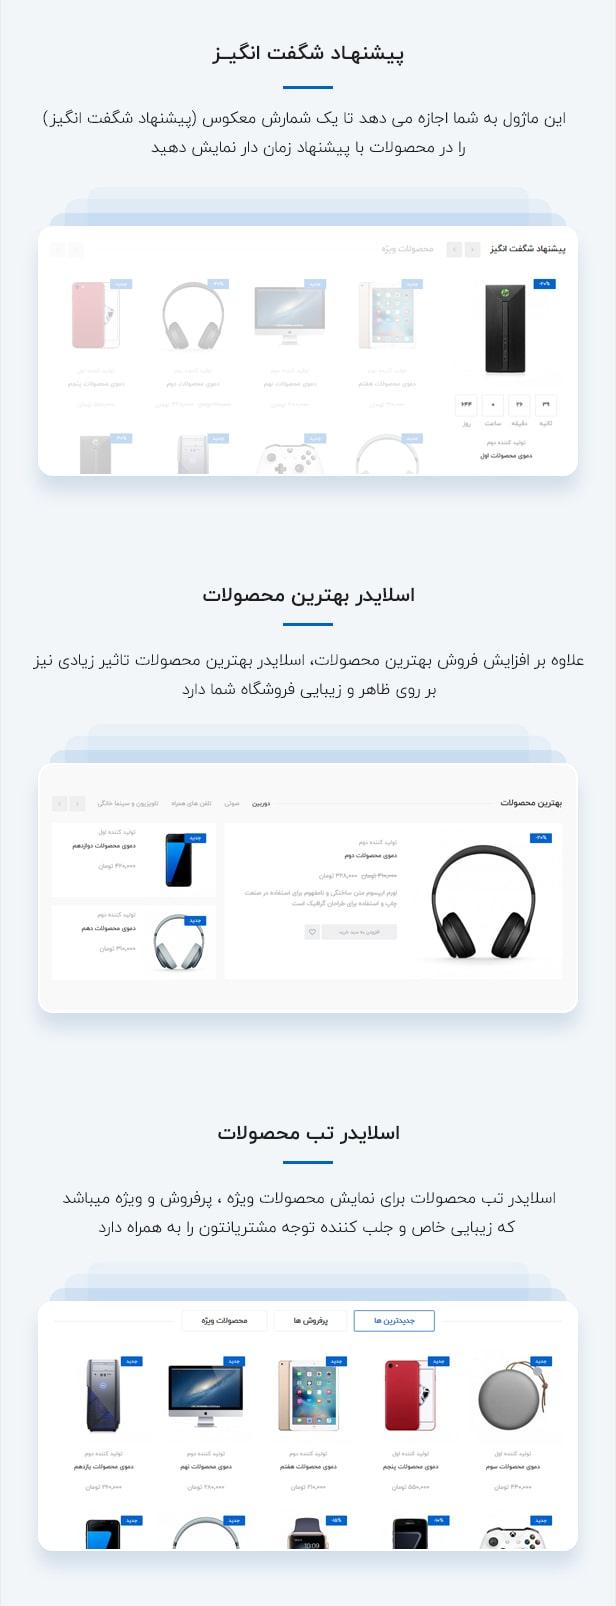 devita-multipurpose-responsive-prestashop-theme-daily-deal-and-category-tab-slider